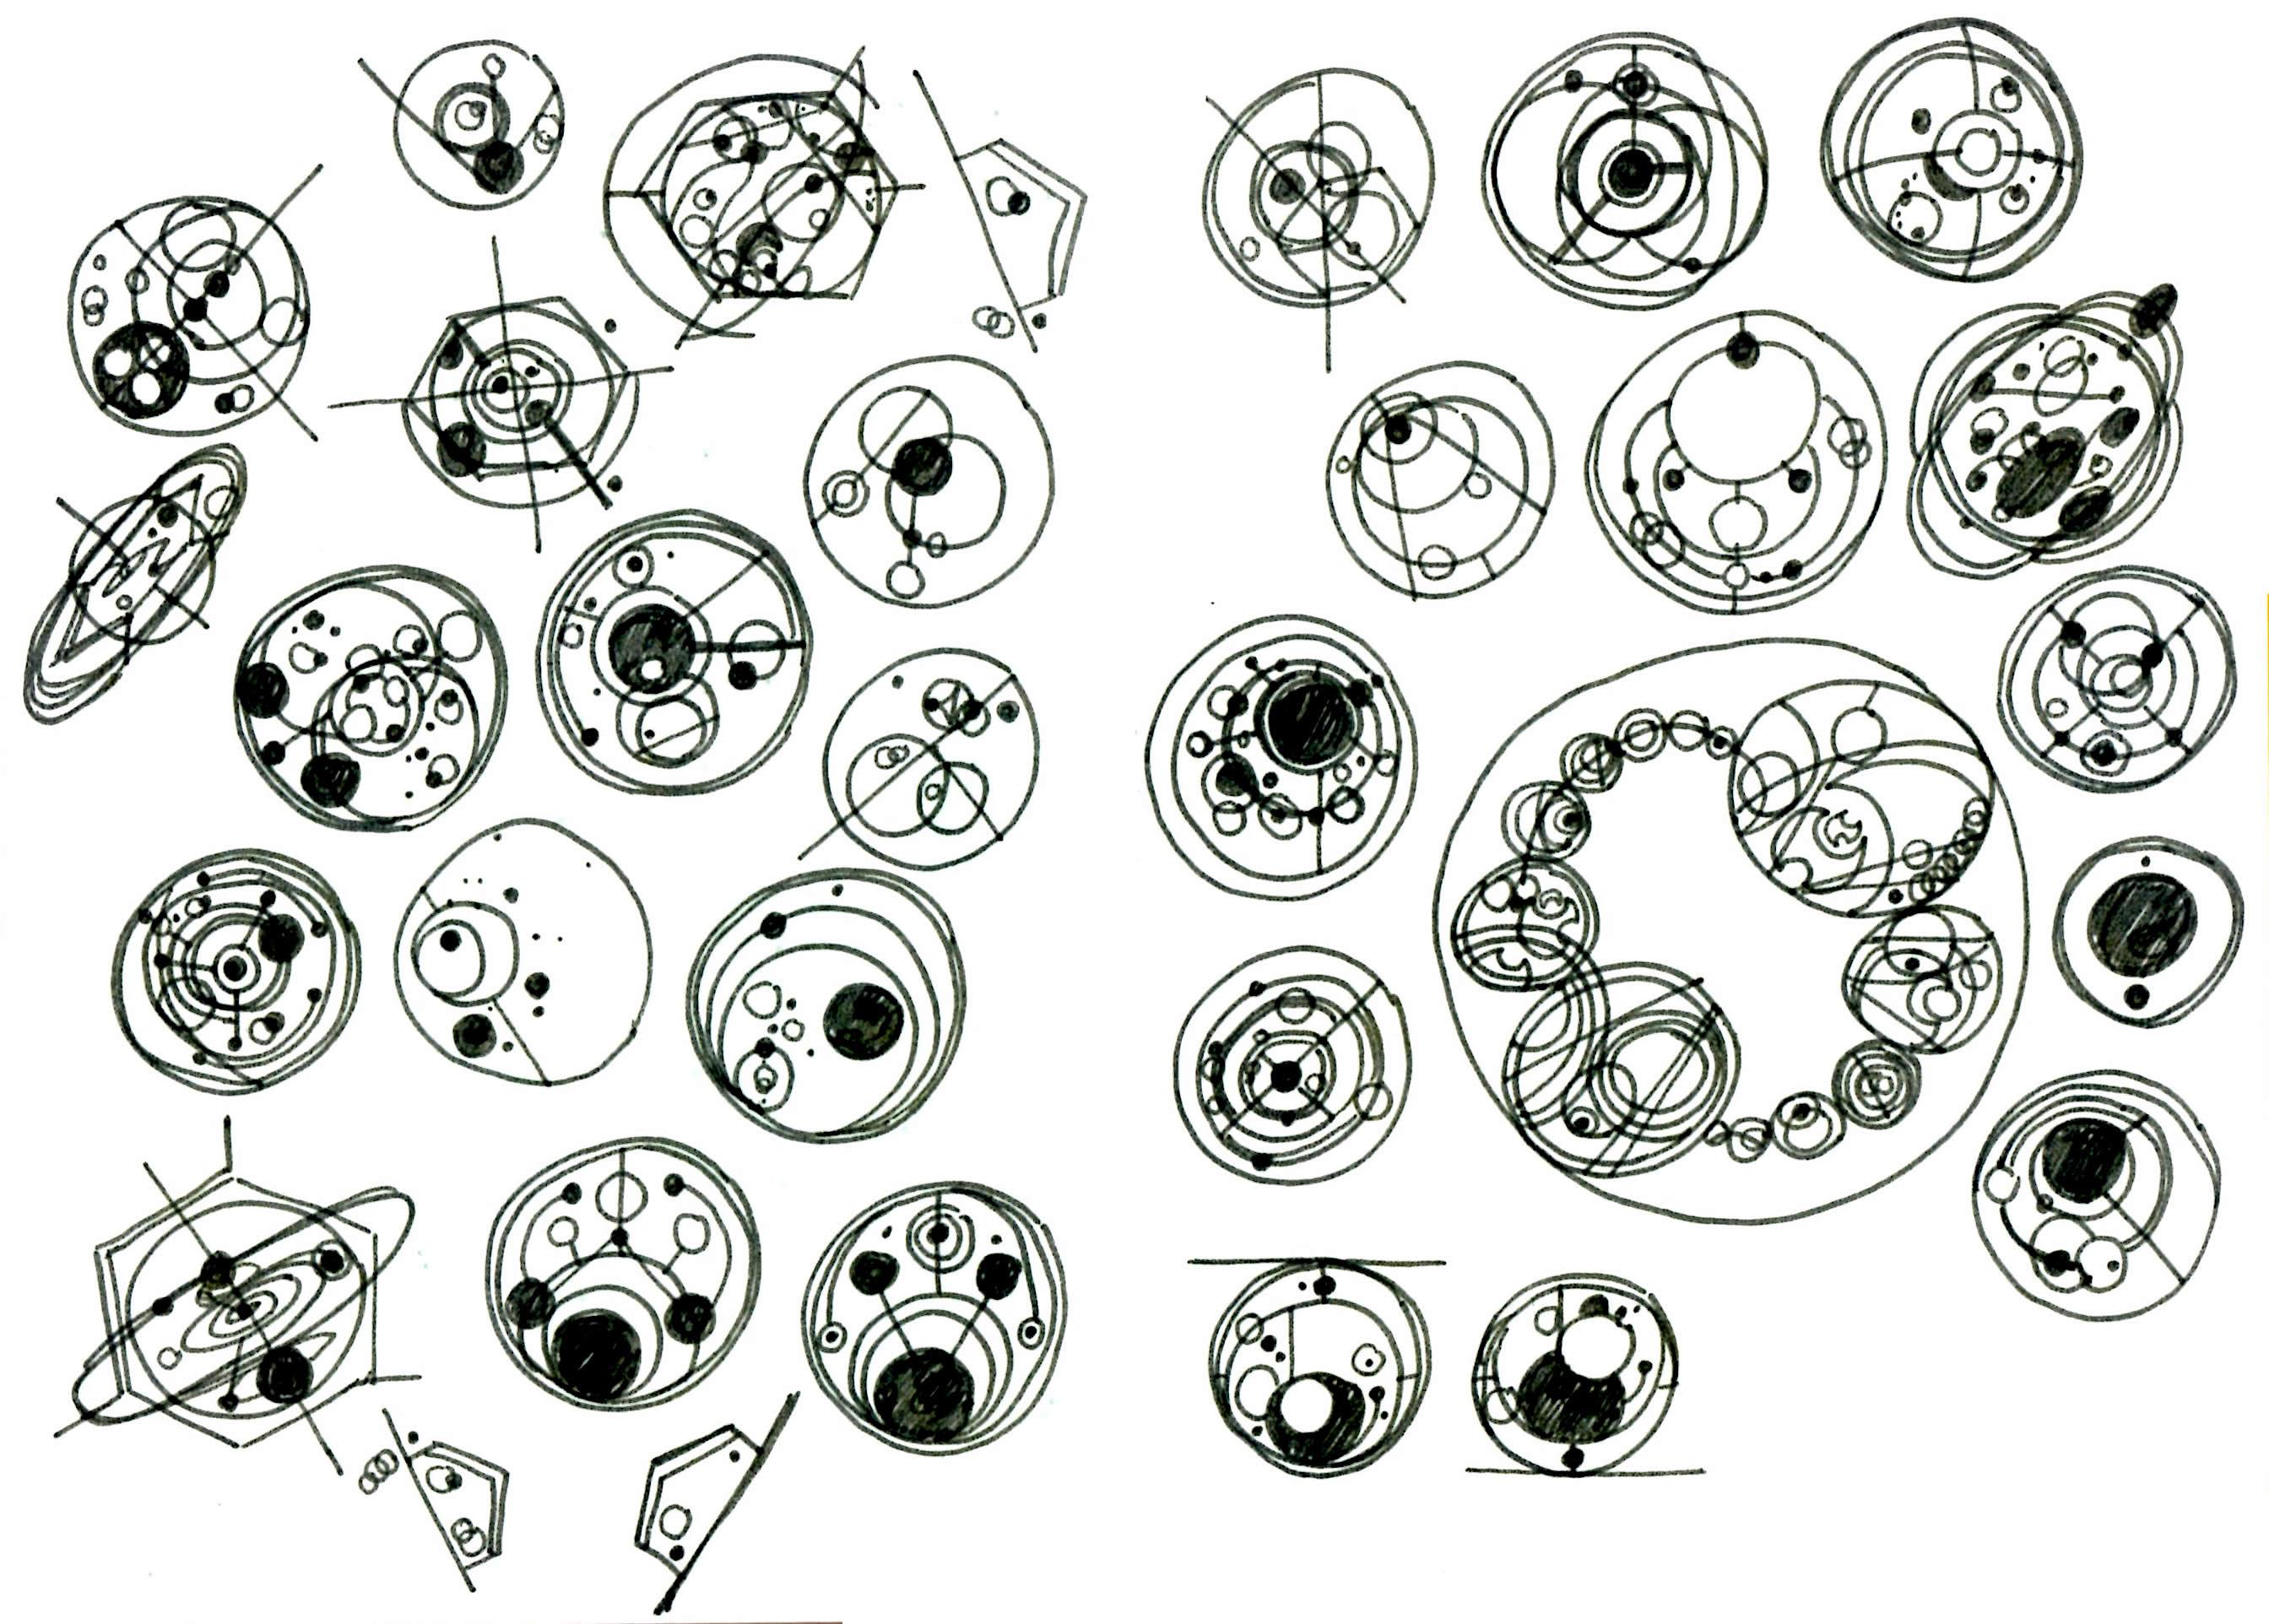 gallifreyan symbols wallpaper - photo #27